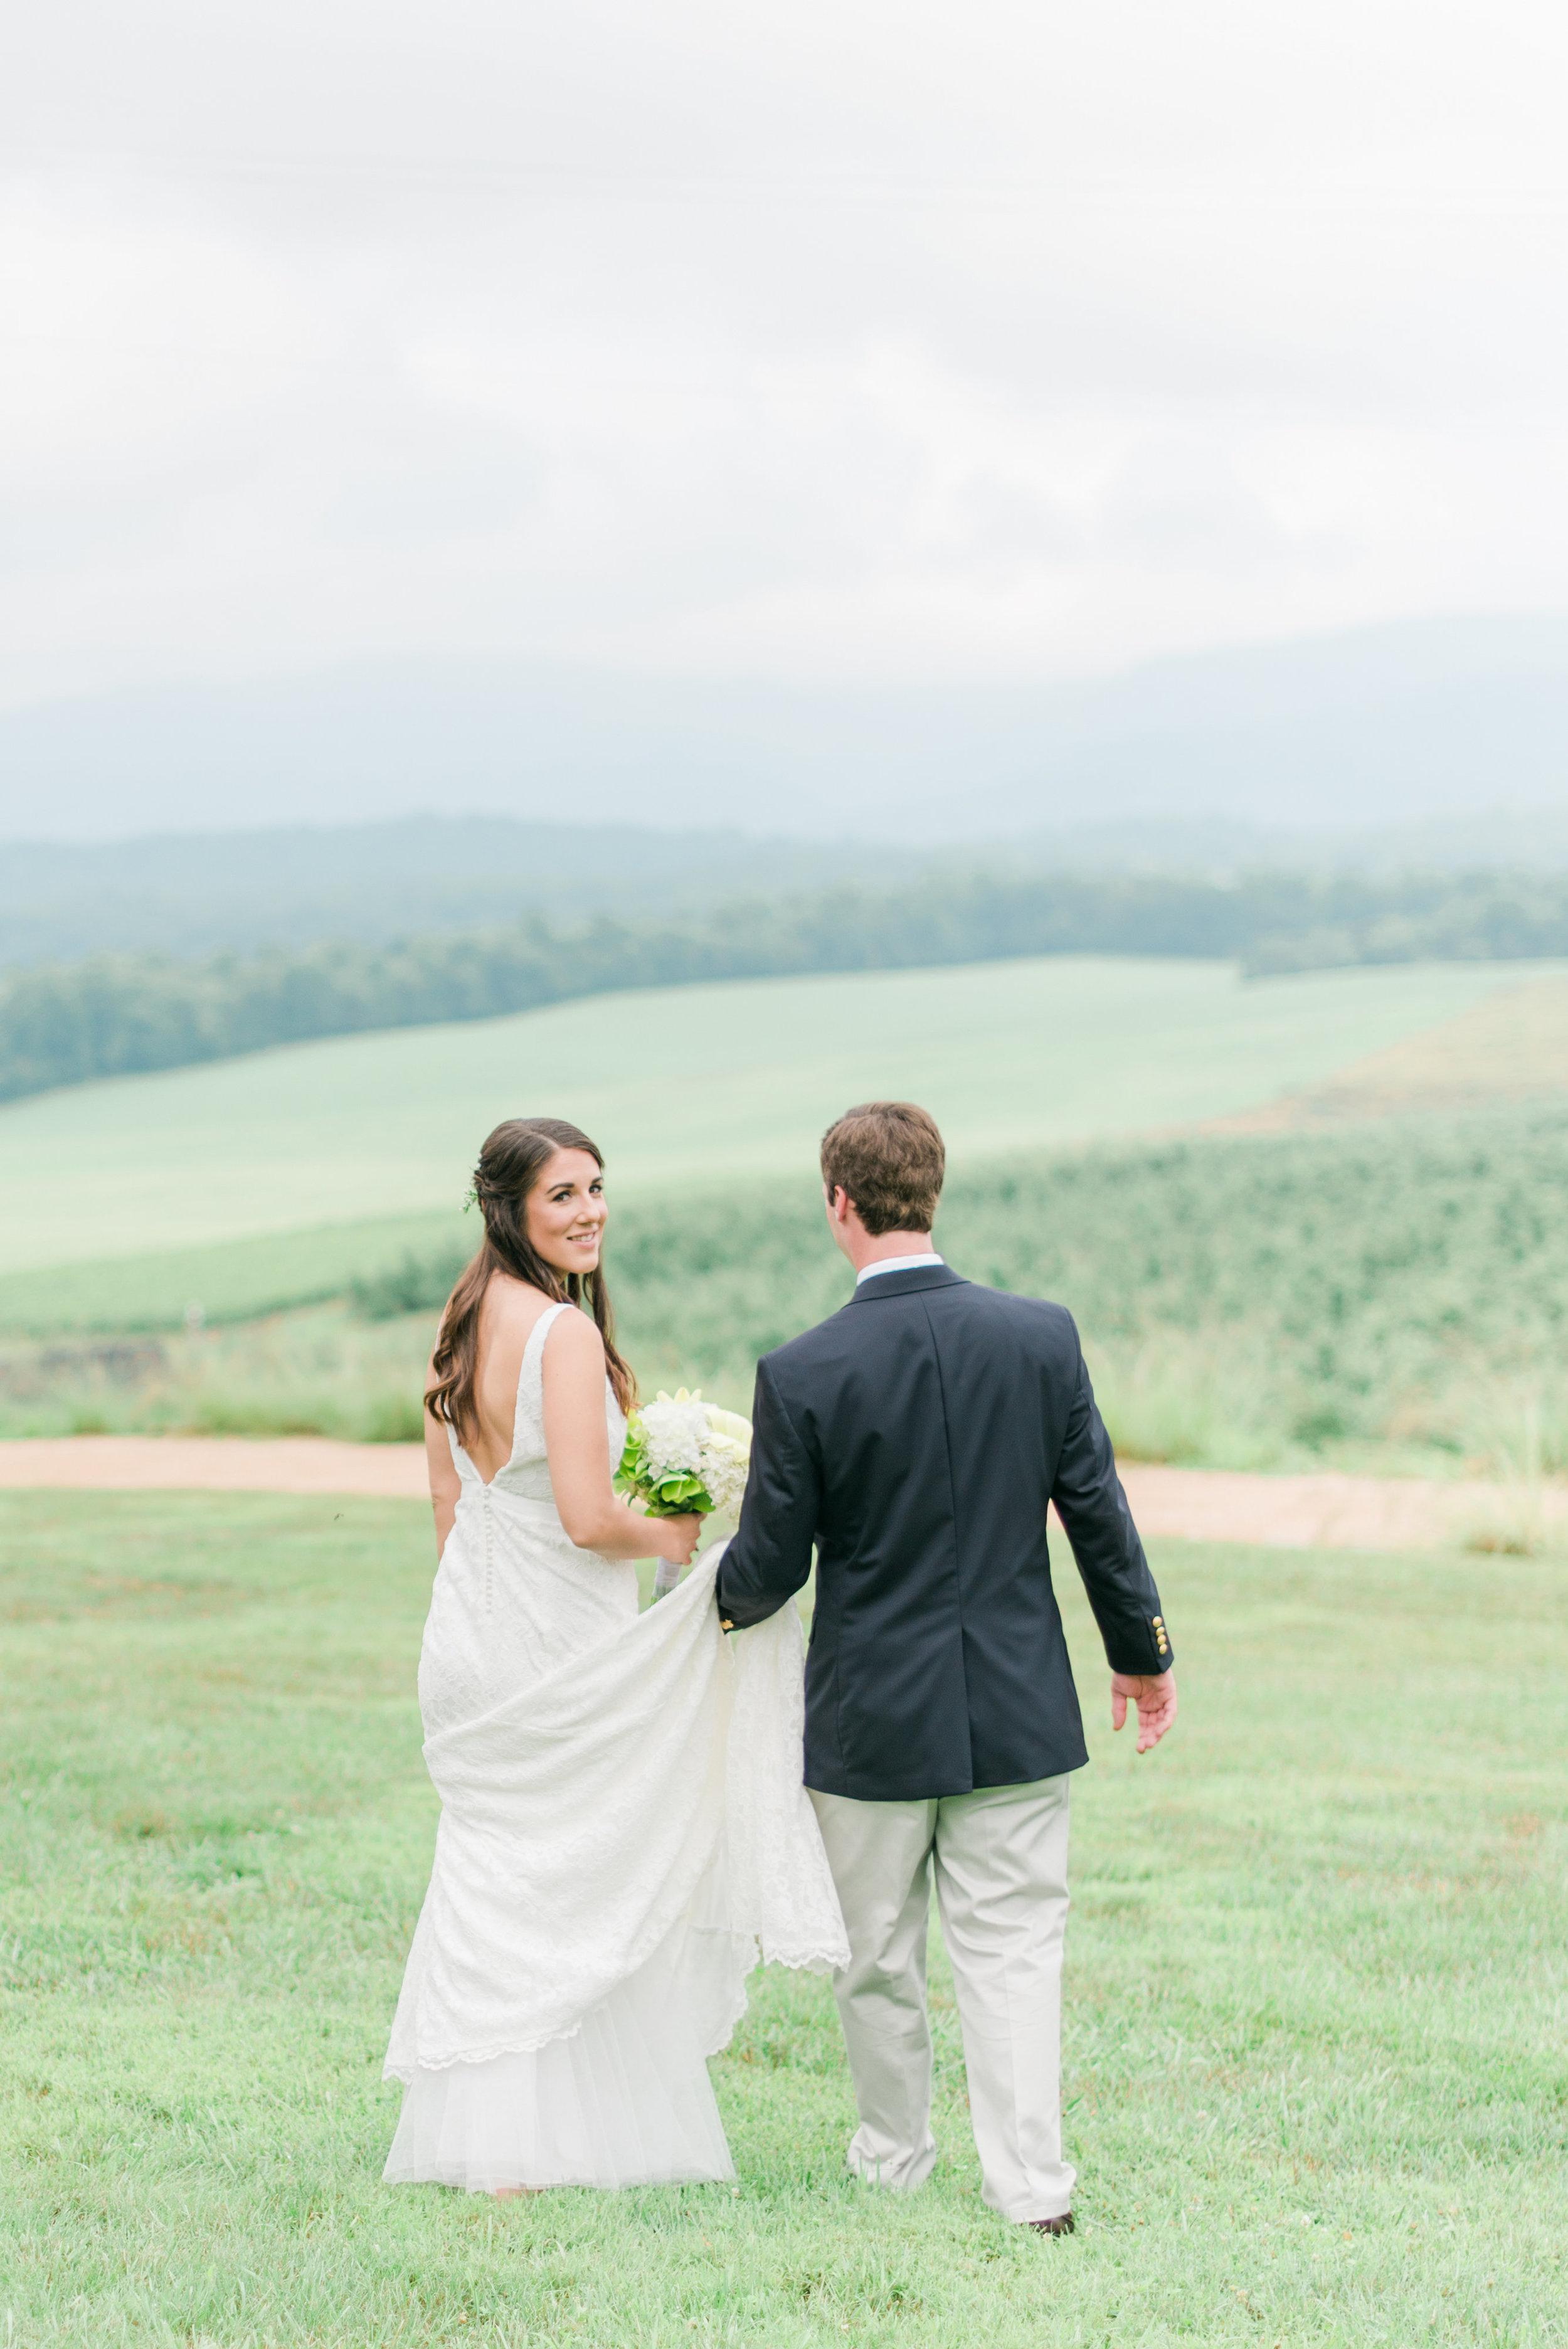 062715-Hannah+Drew-pharsalia-wedding-kathryn-ivy-photography-74.jpg